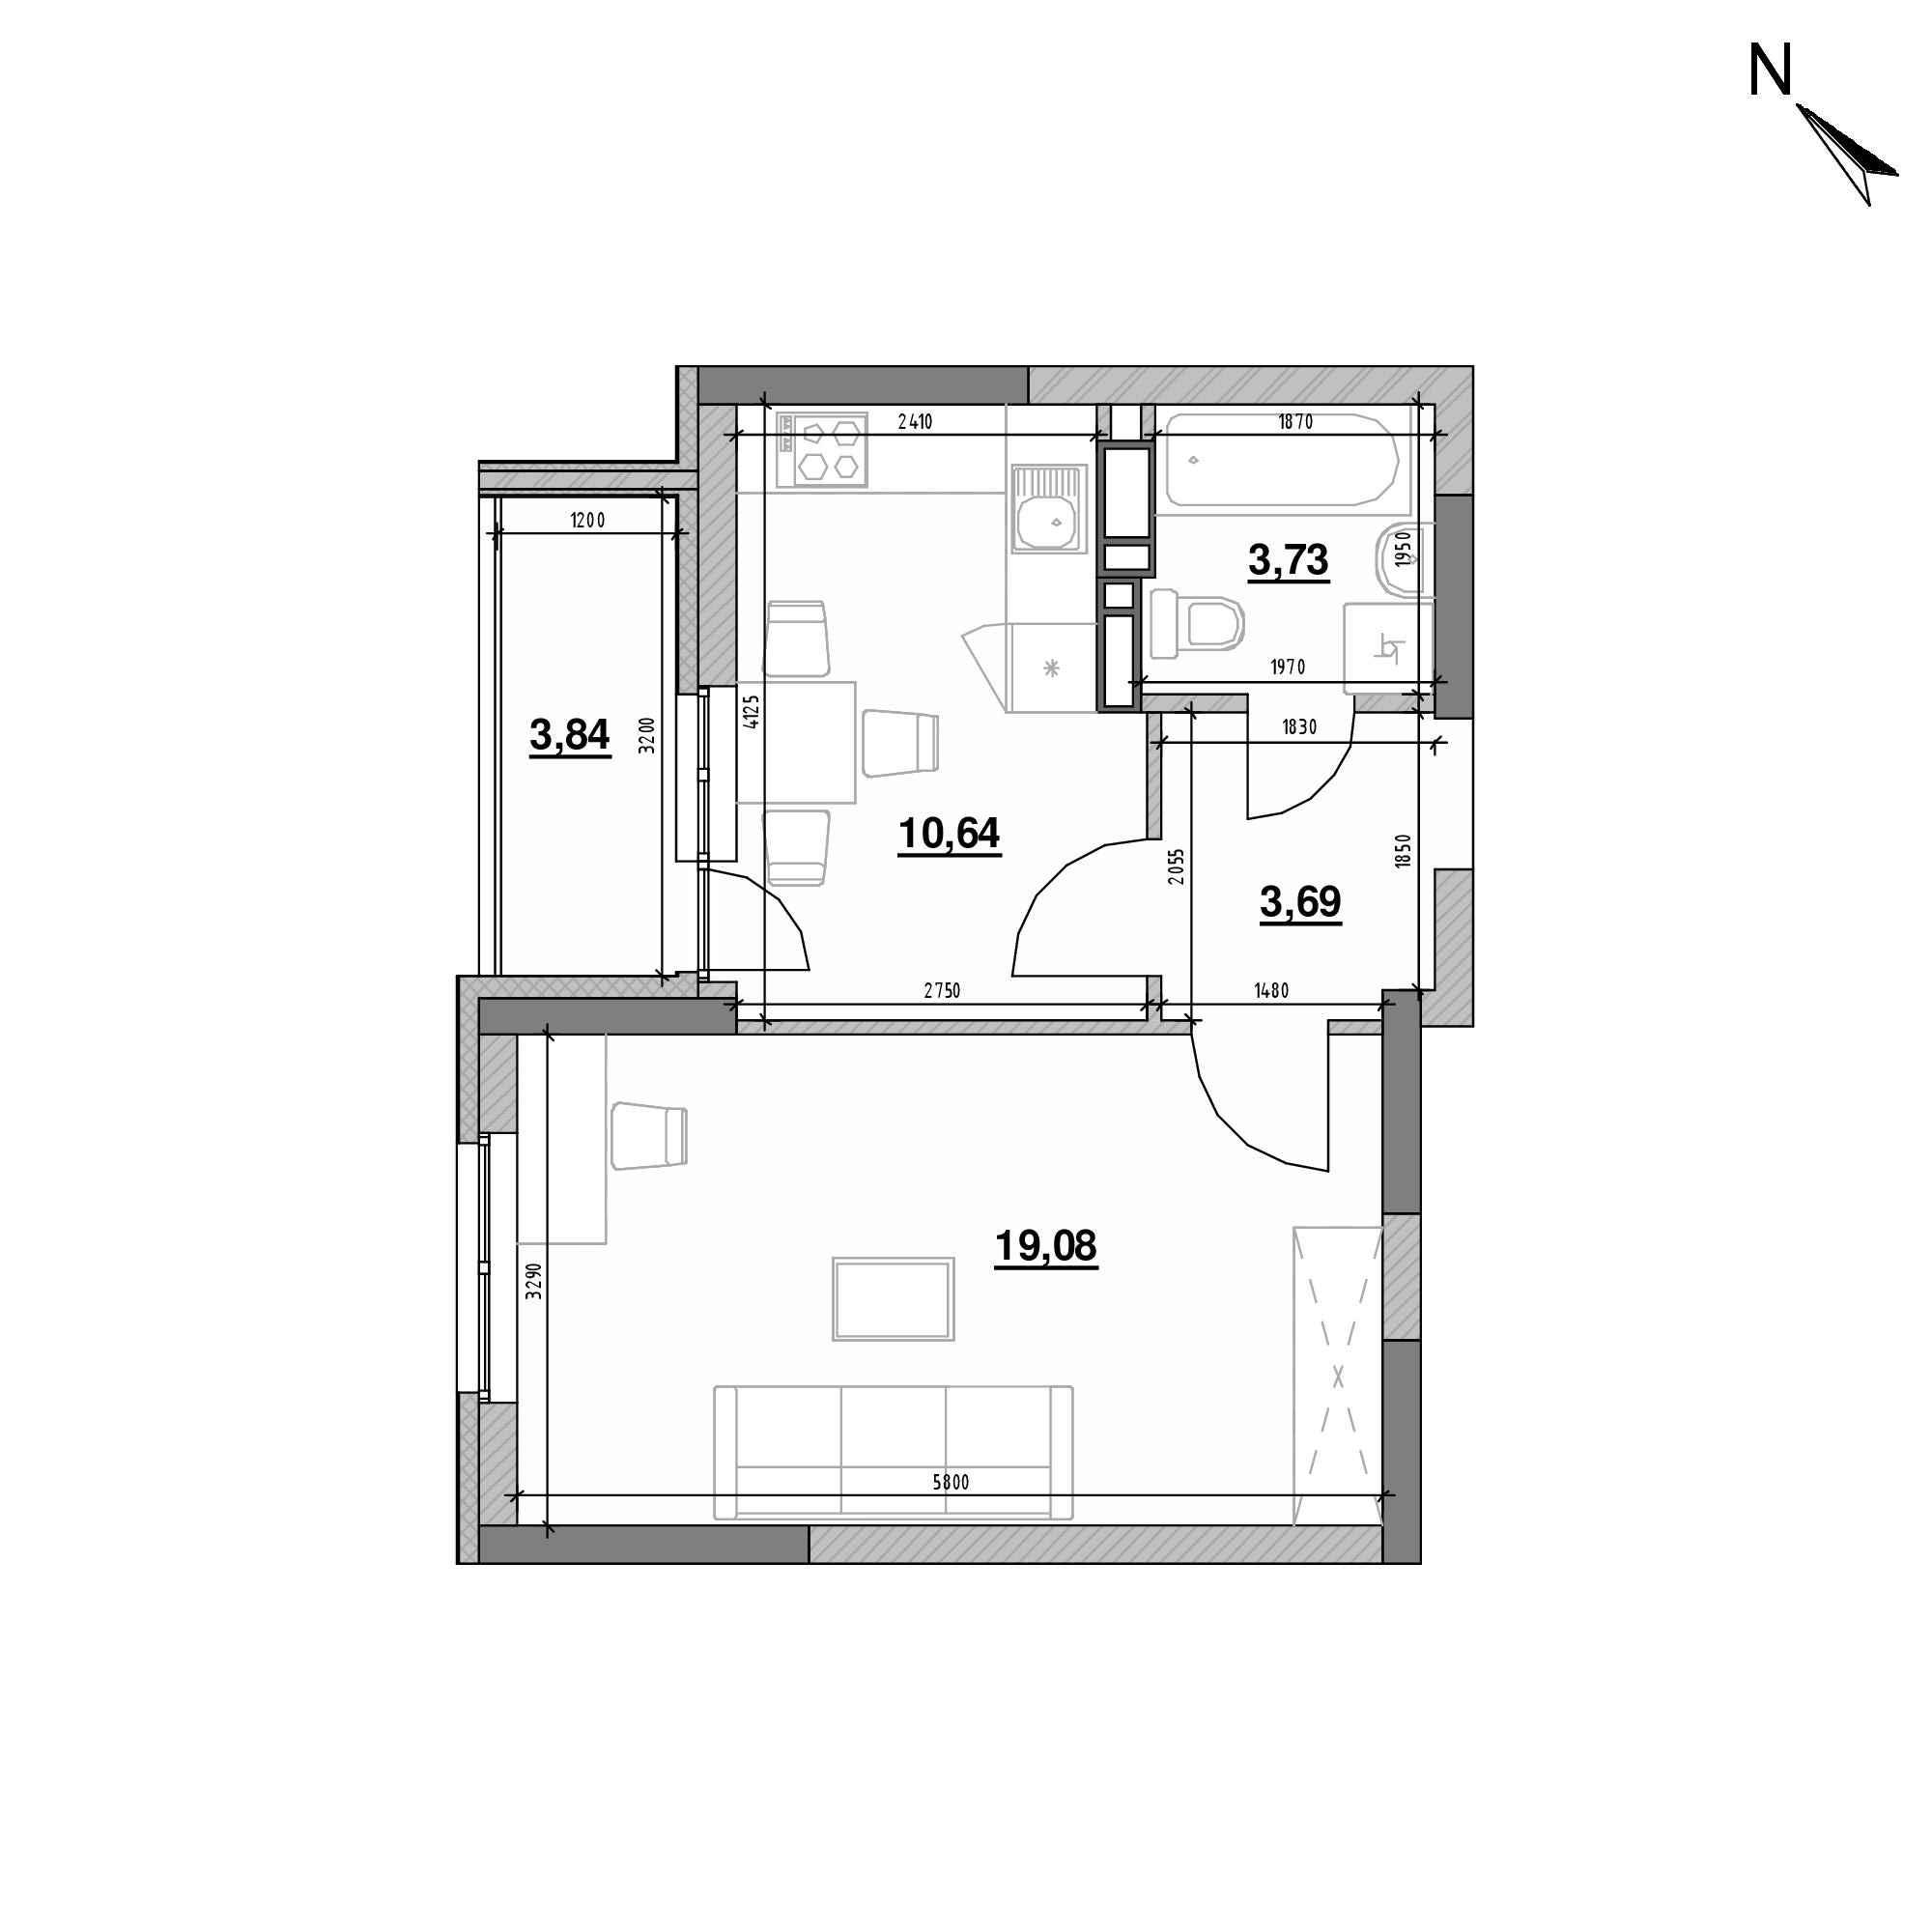 ЖК Оk'Land: планування 1-кімнатної квартири, №255, 40.98 м<sup>2</sup>